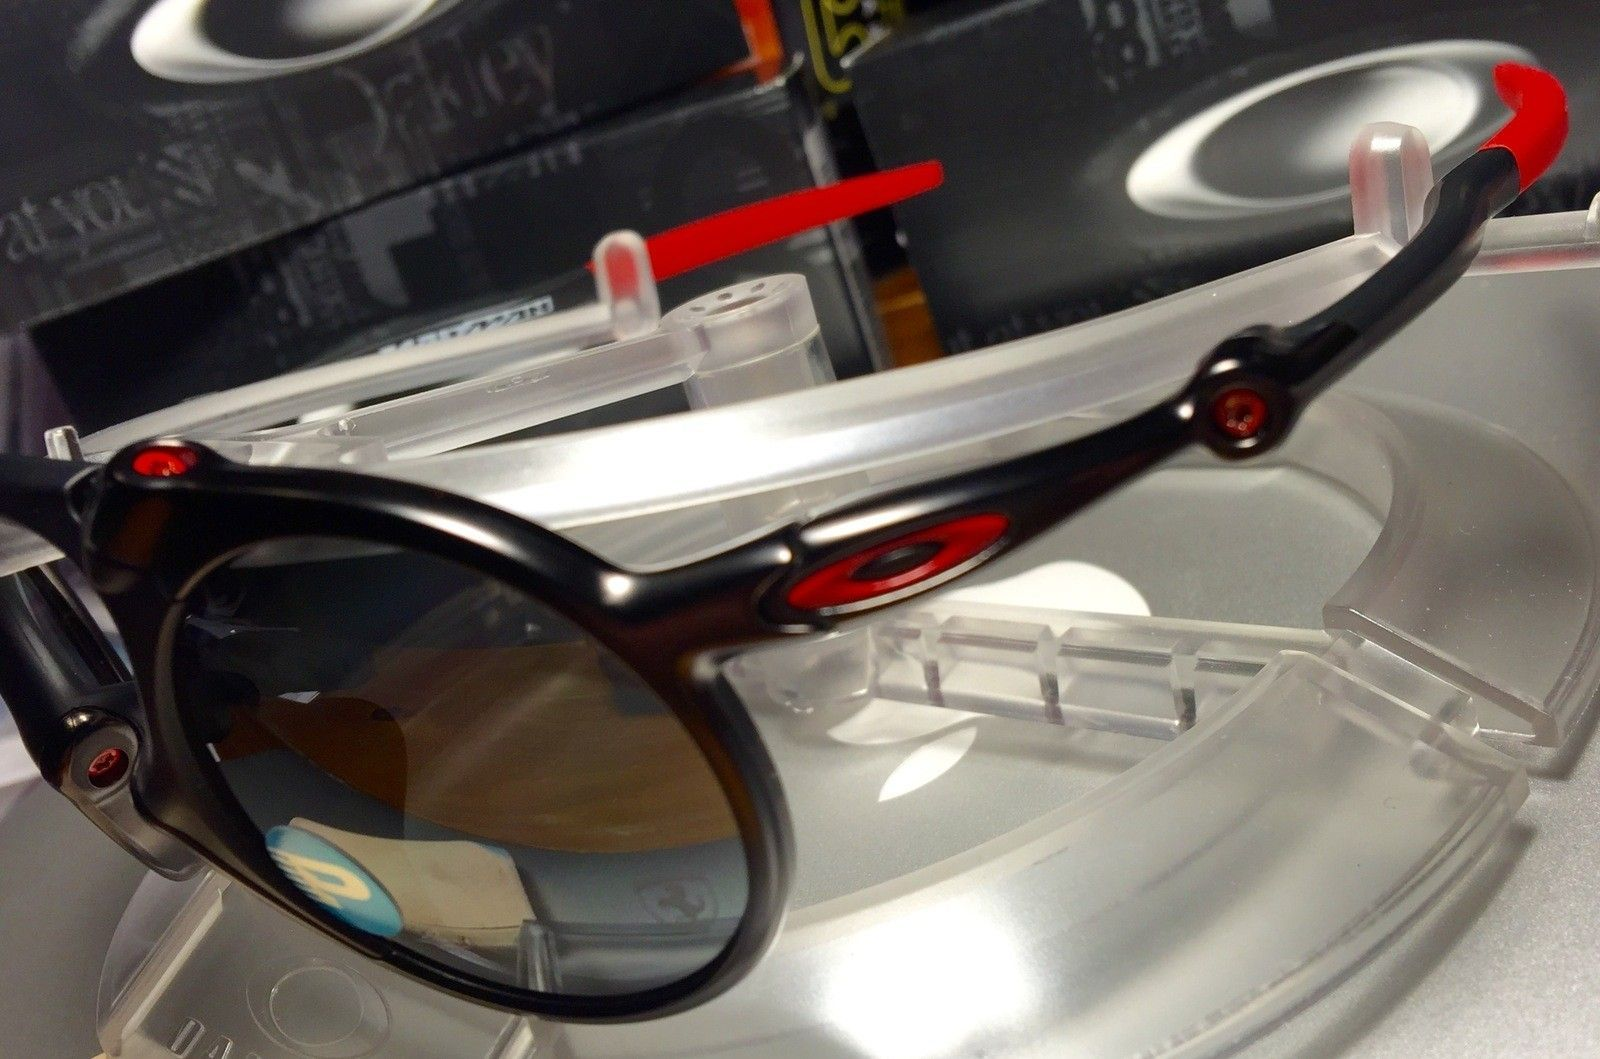 NEW Madman Scuderia Ferrari for Robotic Store Front - image.jpeg